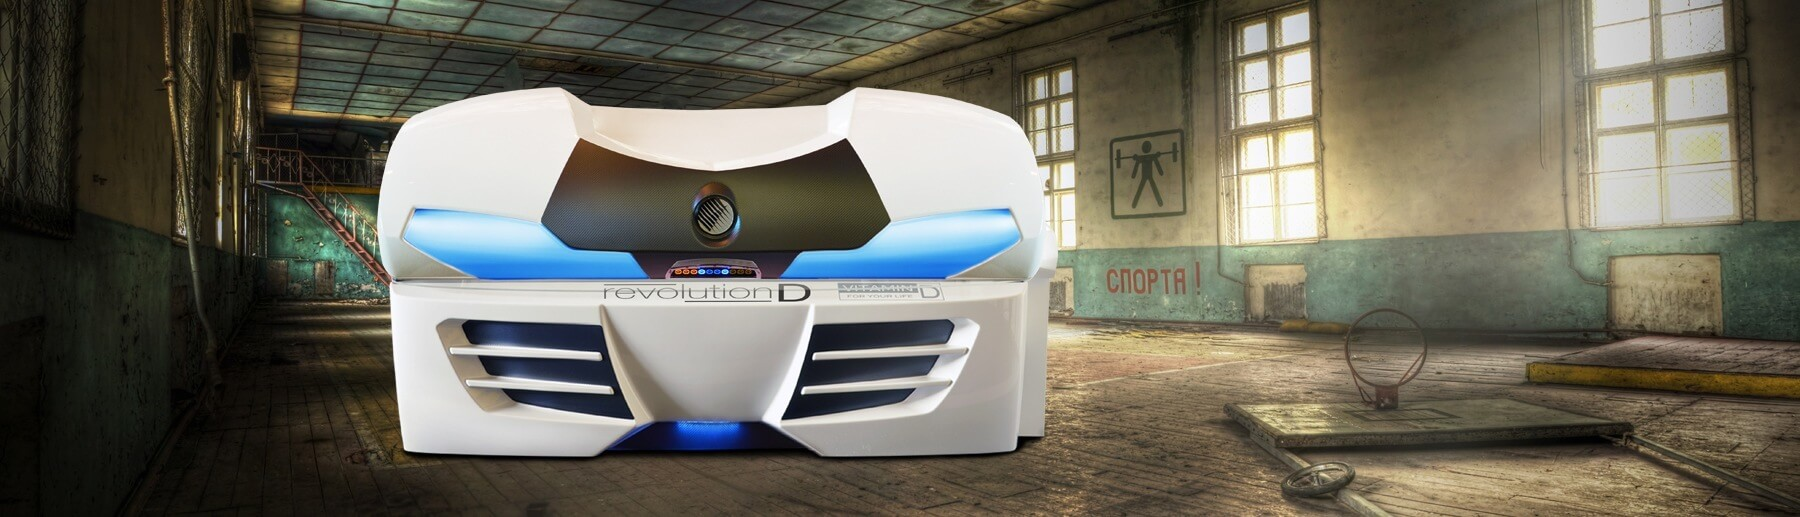 Aparat de bronzat Megasun seria Collarium model Revolution D